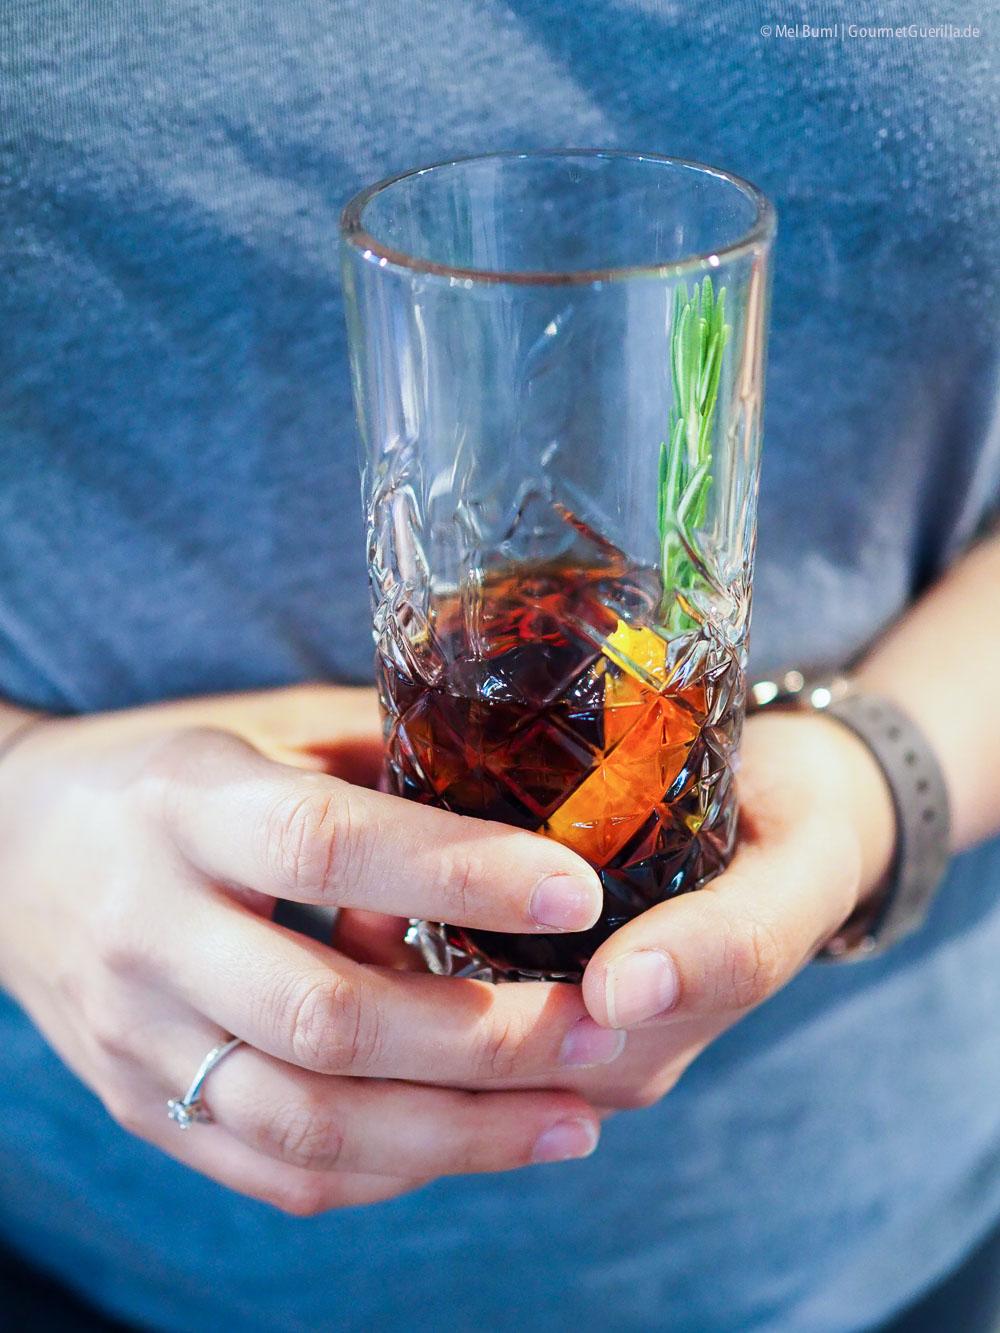 Sizilianisches Dinner und das Amaro-Ritual |GourmetGuerilla.de